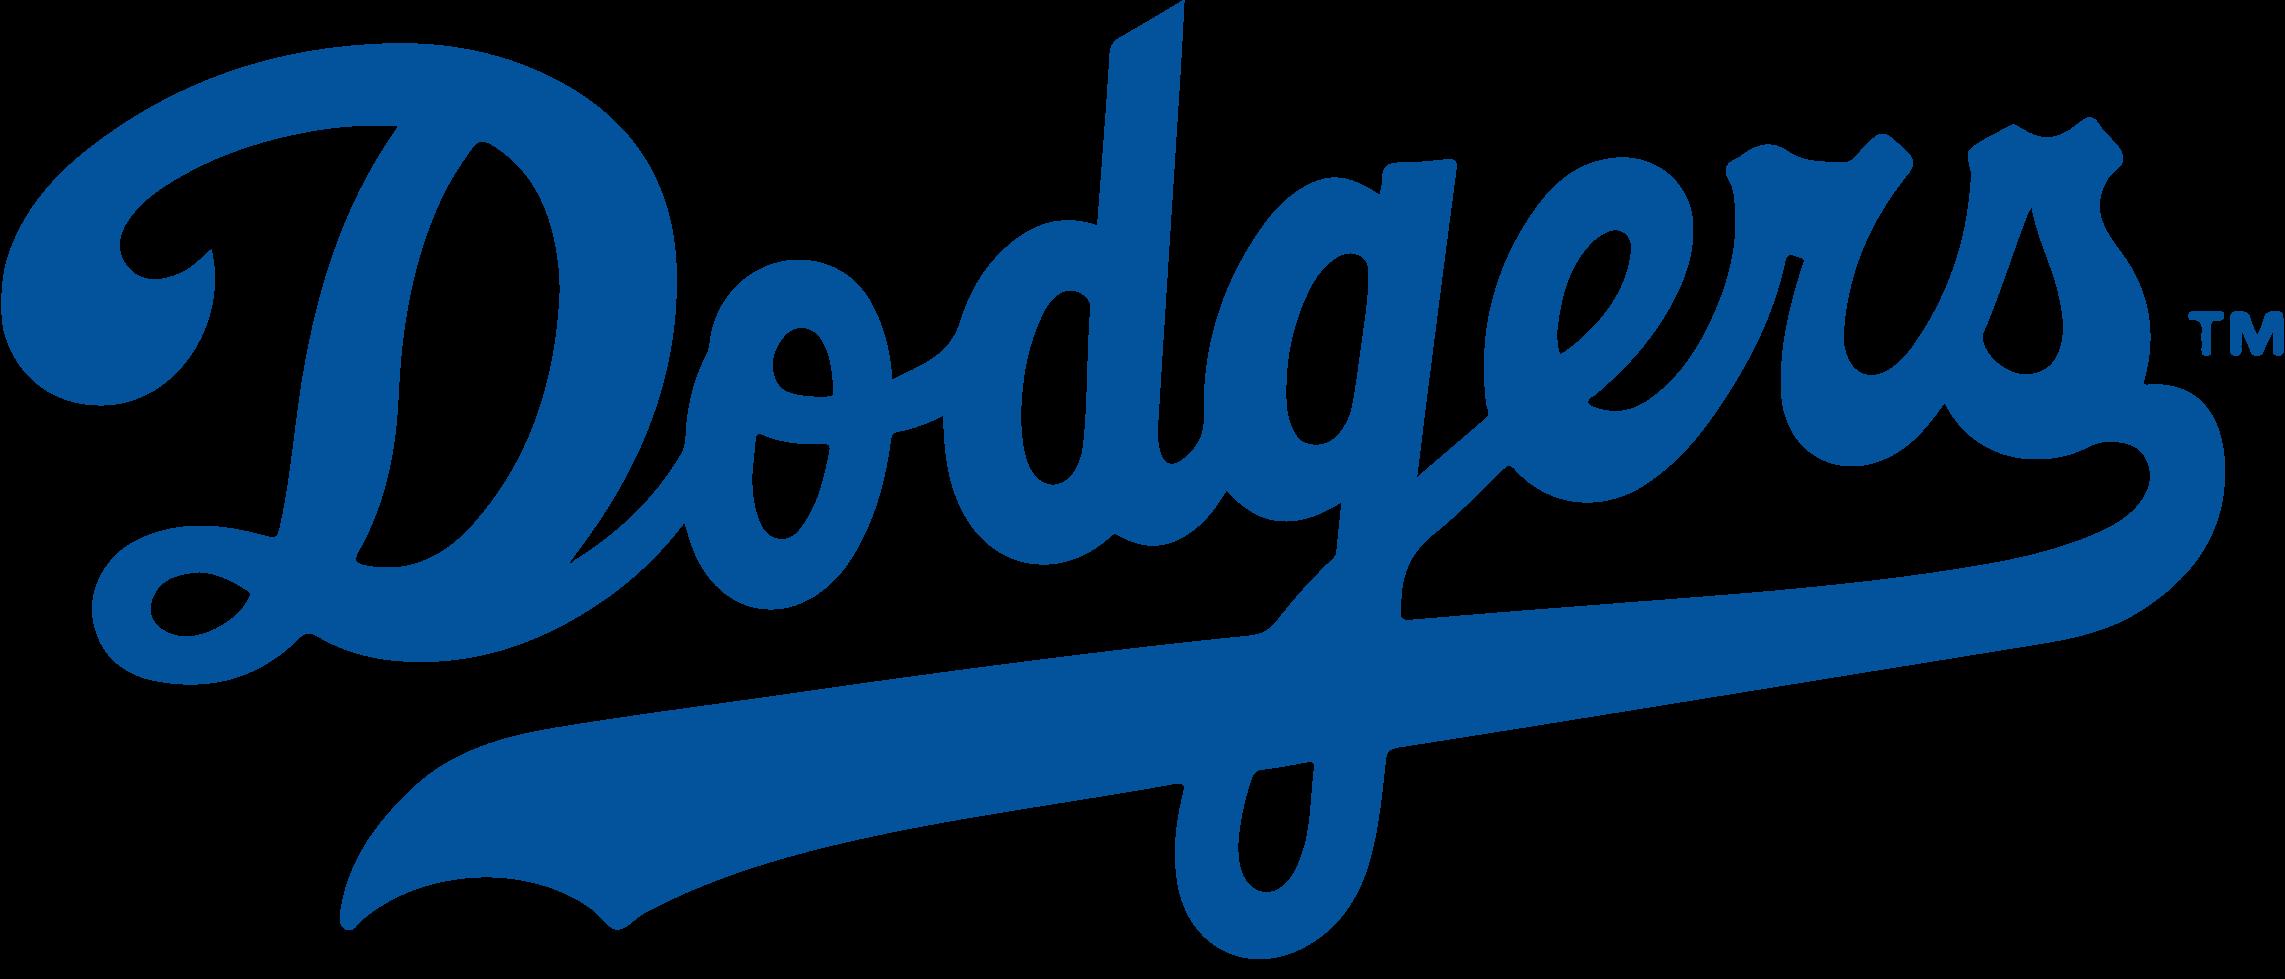 2285x979 Brooklyn Los Angeles Dodgers Chicago Cubs Mlb Logo